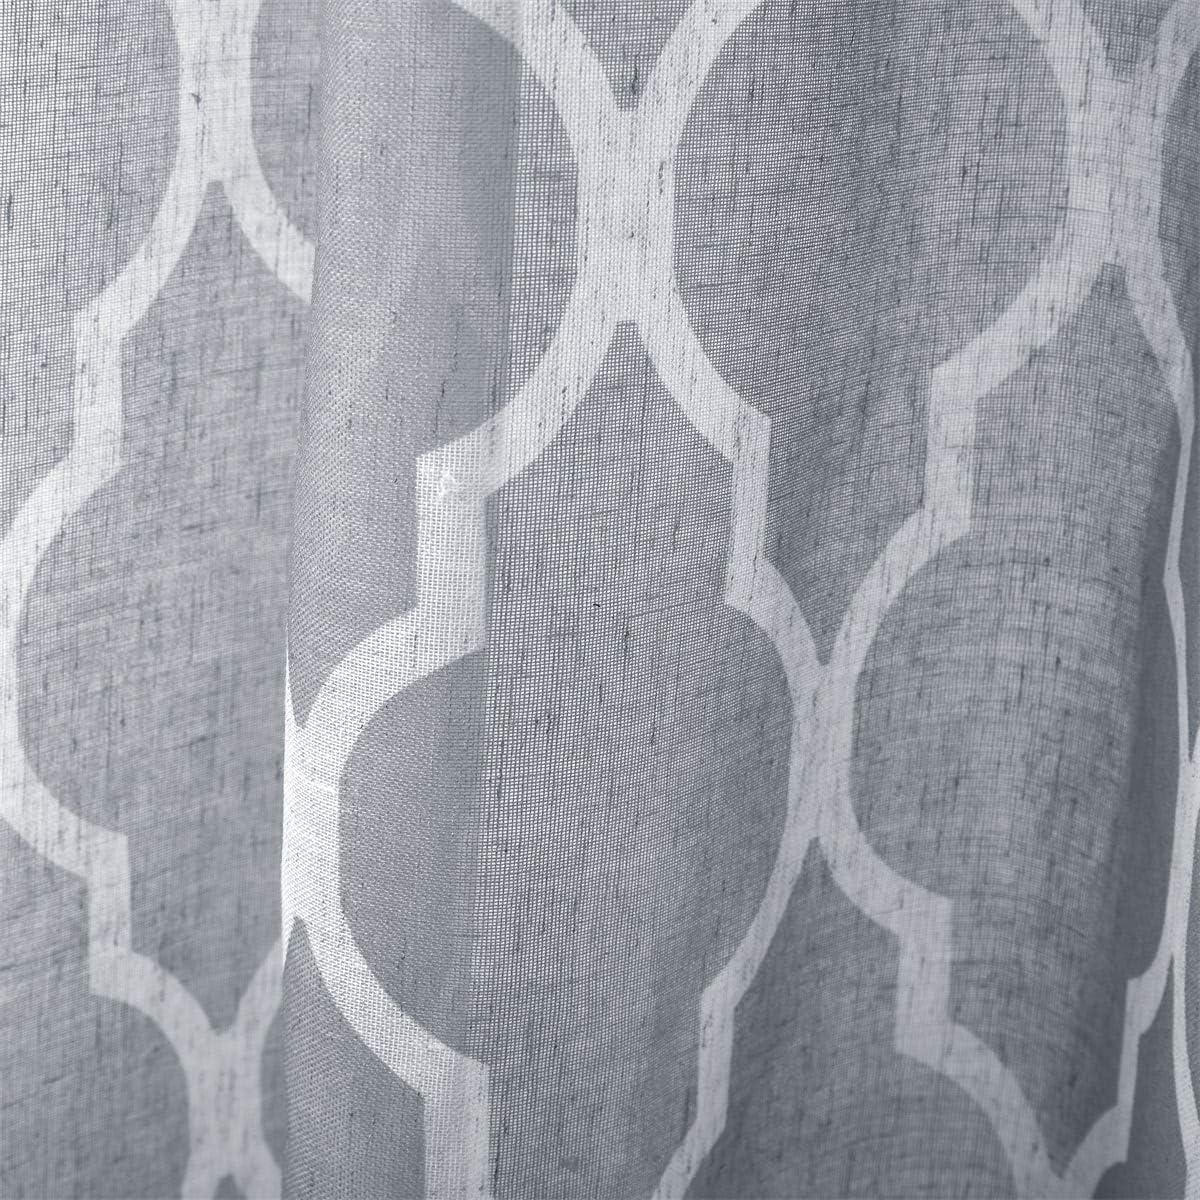 2 Panels 42 W x 63 L LoyoLady Cyan Blue Linen Pattern Sheer Curtains for Boys Bedroom Grommet Top Window Curtain 63 inch Length